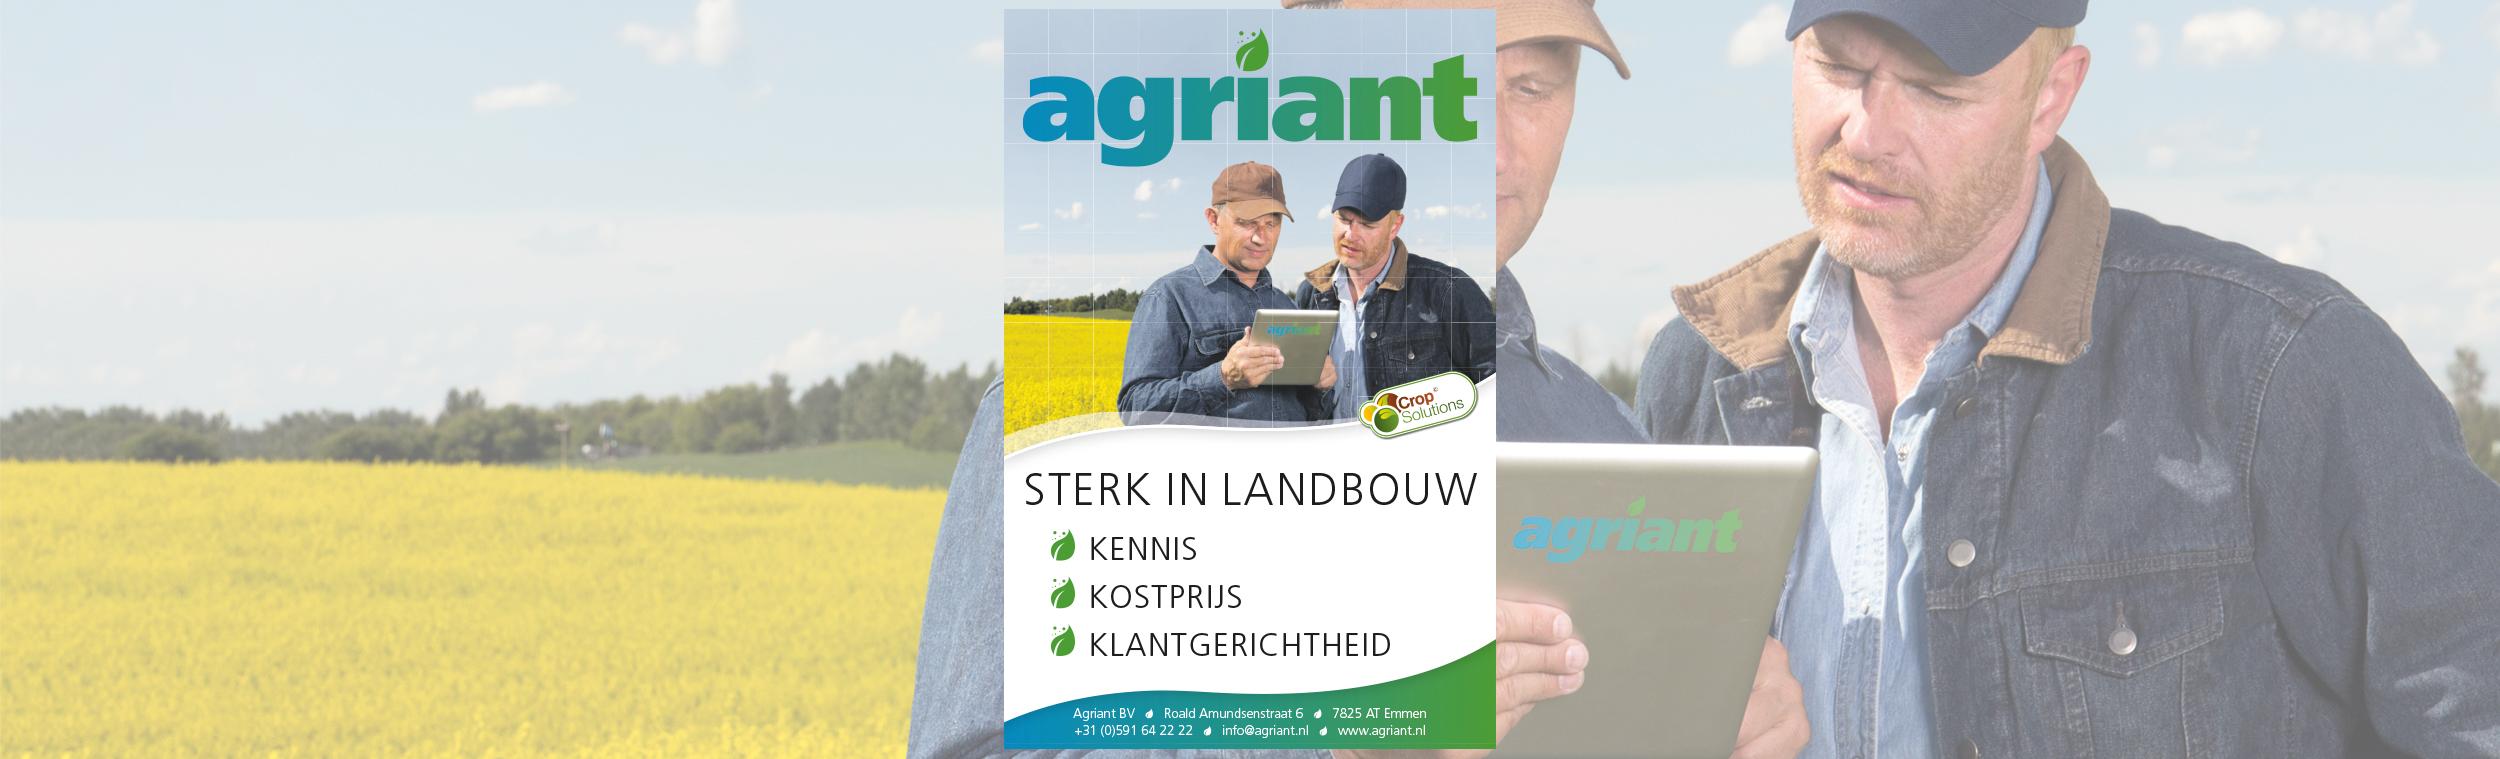 portfolio-agriant-advertentie